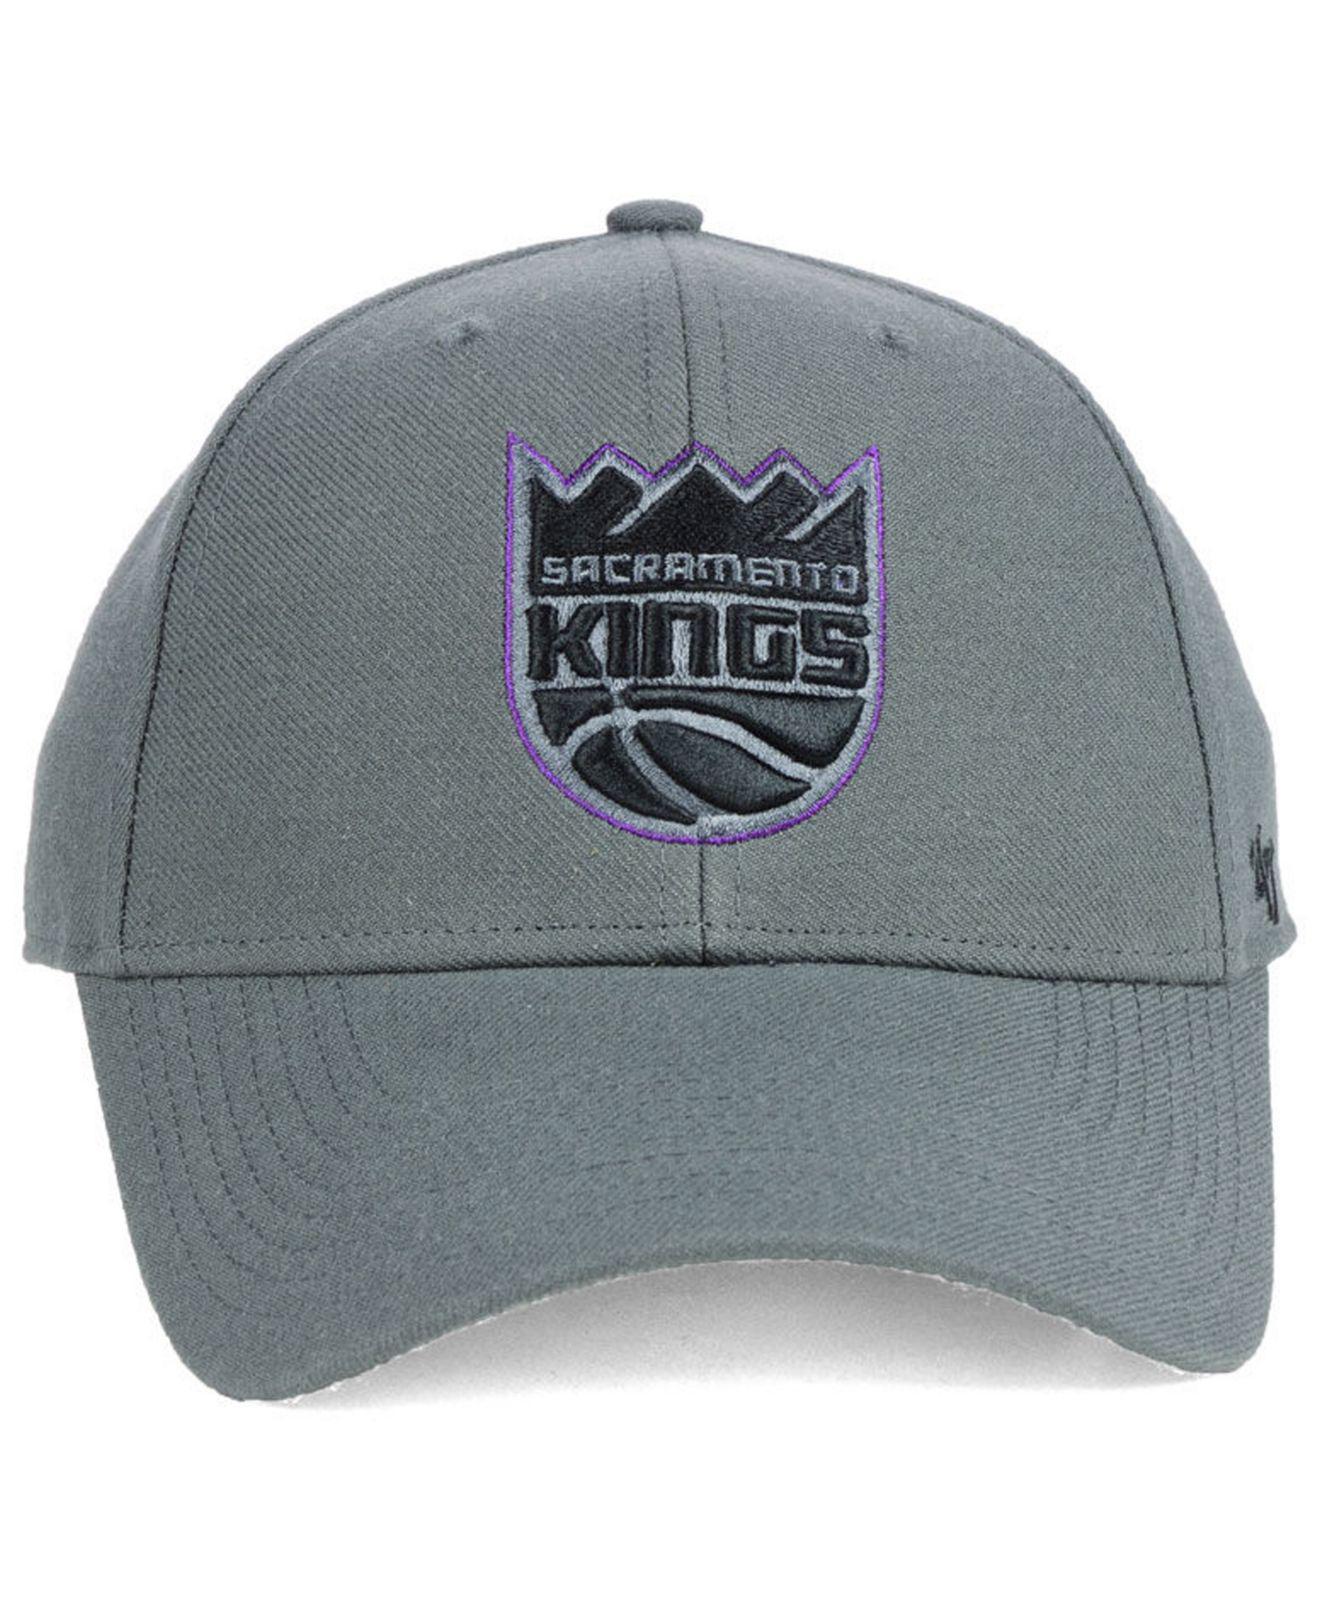 41e6fc3b3cf4a Lyst - 47 Brand Sacramento Kings Charcoal Pop Mvp Cap in Gray for Men